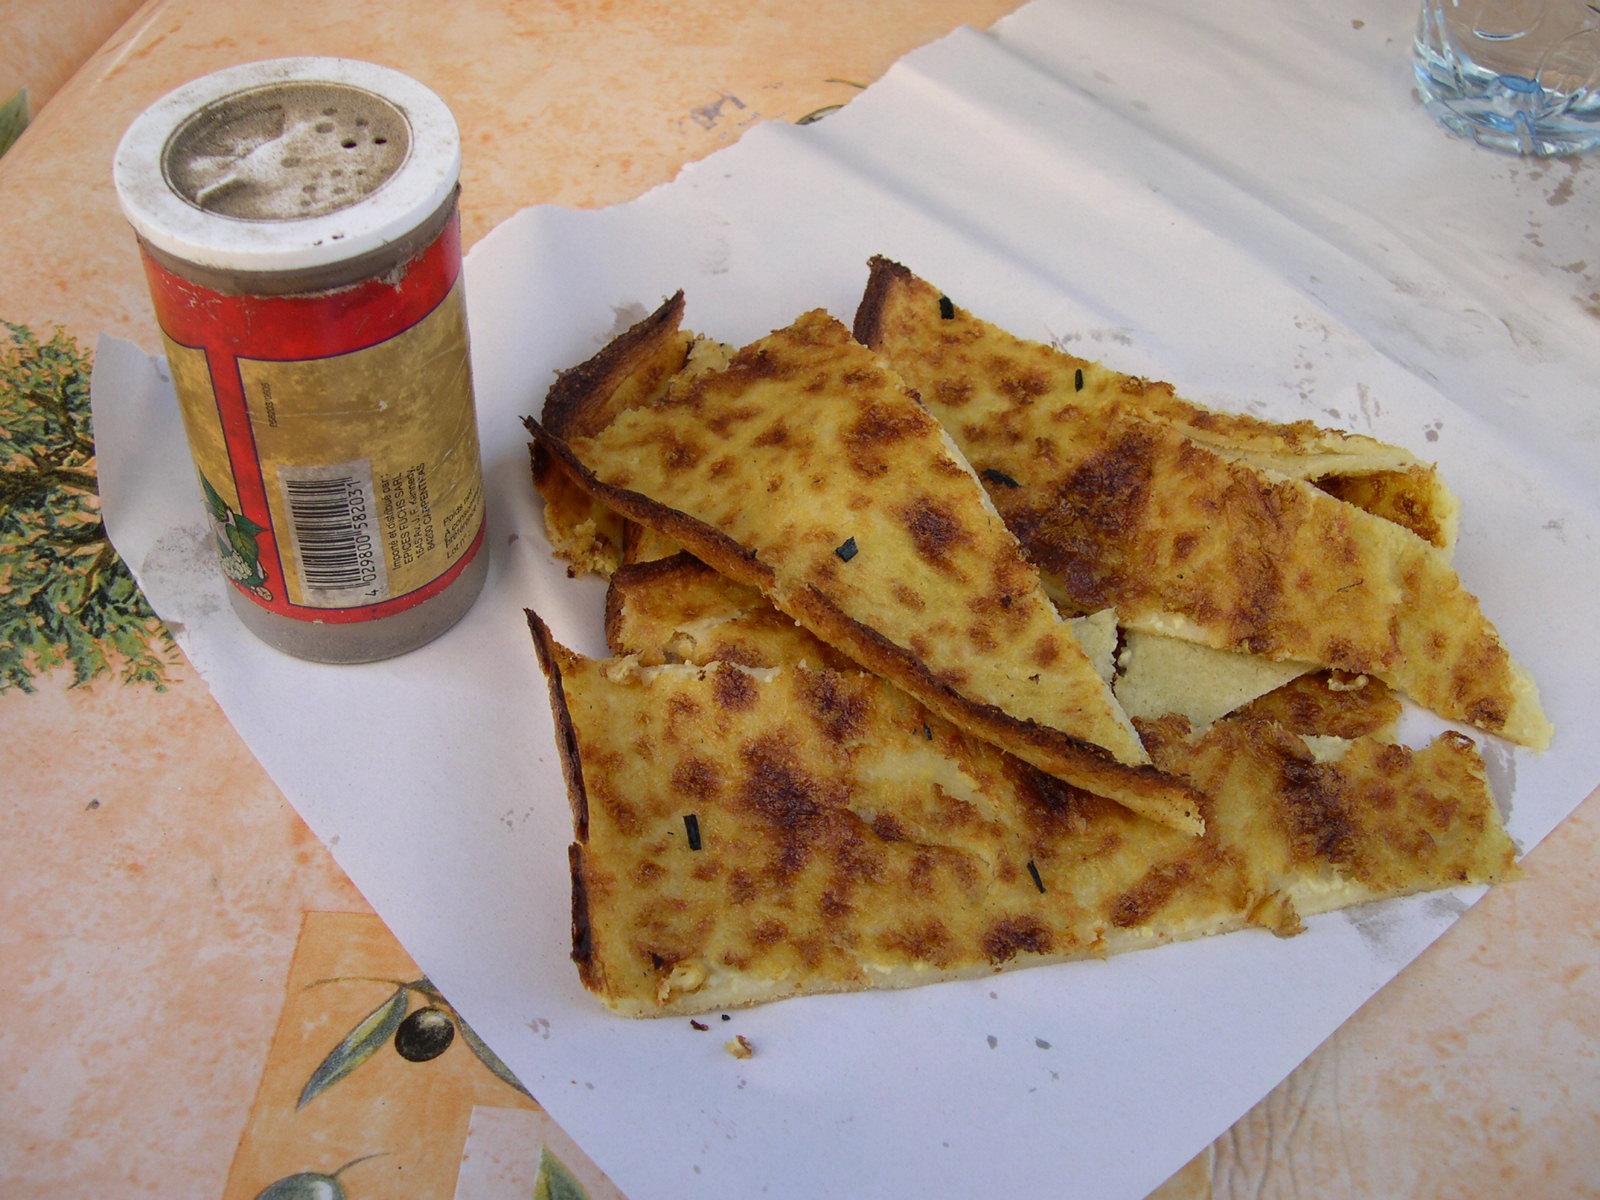 File:Socca slices Nice.jpg - Wikimedia Commons